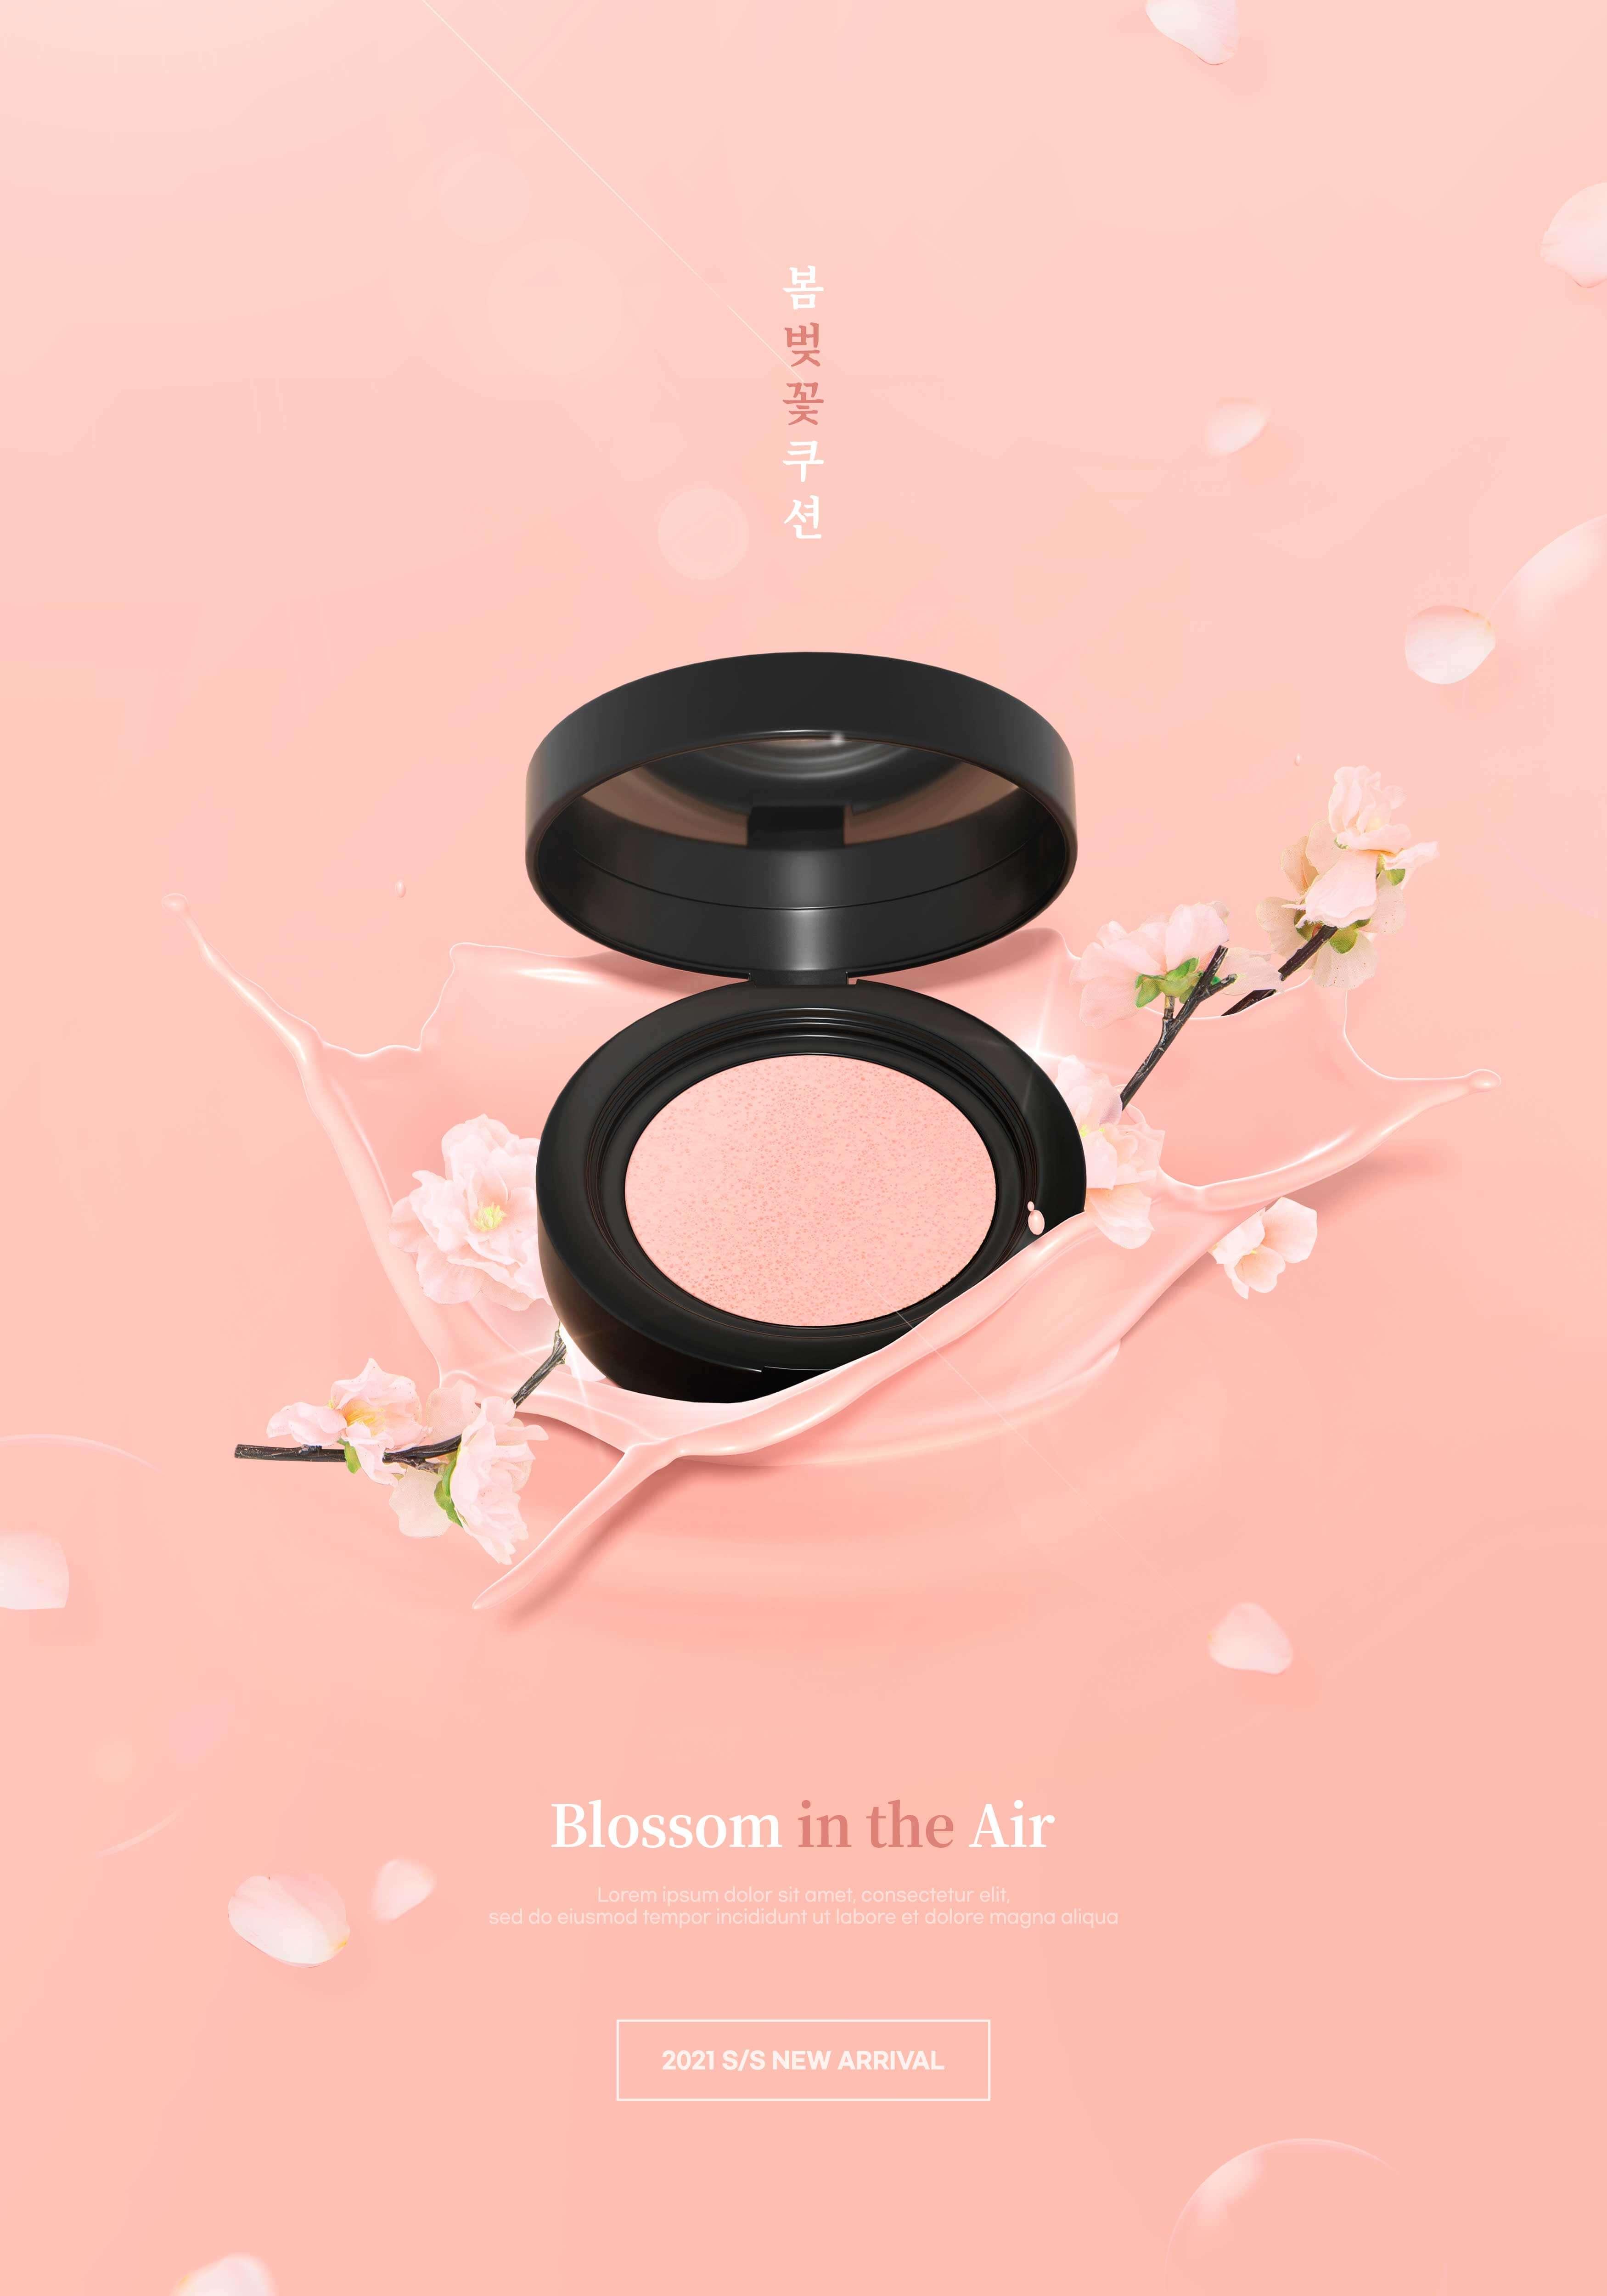 新品粉饼化妆品宣传海报设计designshidai_haibao42